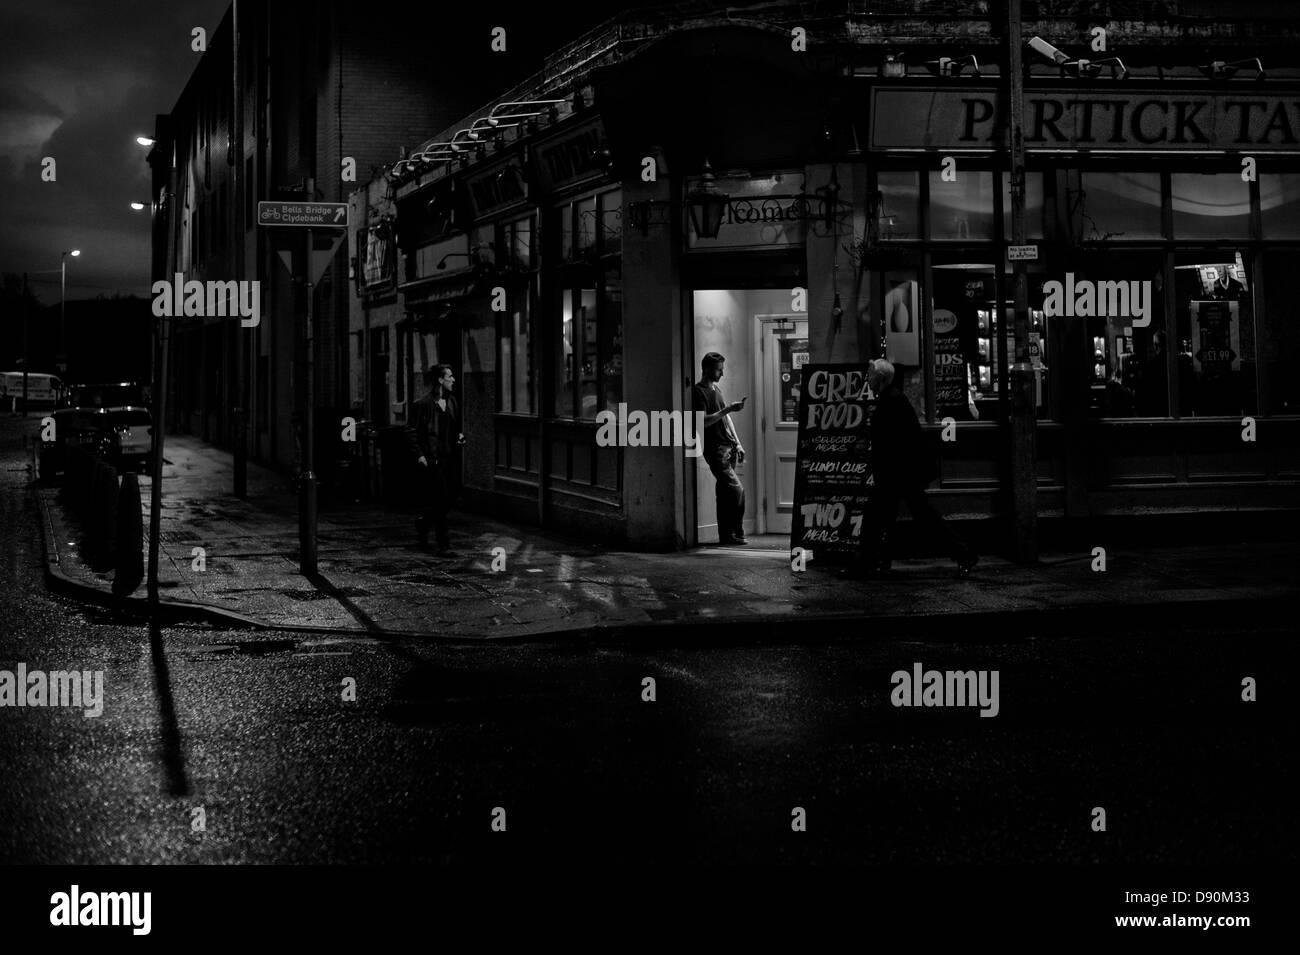 View of street scene outside the Partick Tavern, Dumbarton Road, Glasgow, Scotland, UK - Stock Image